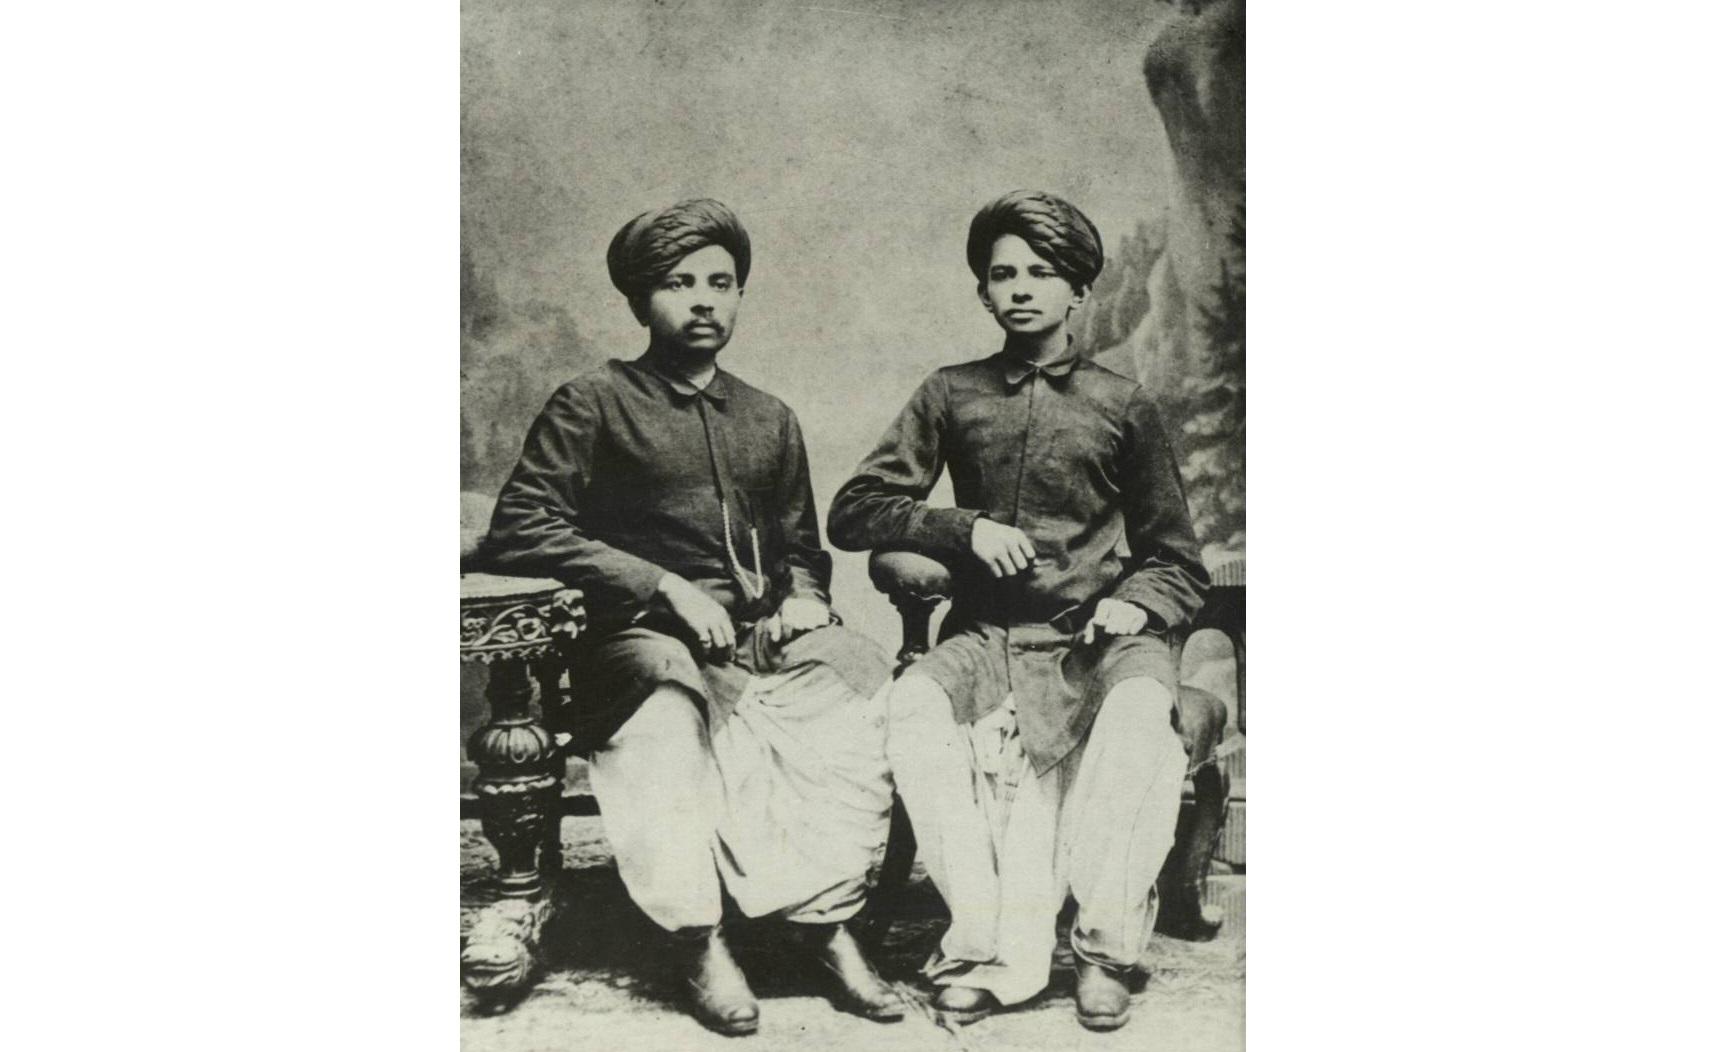 The Gandhis of Porbandar